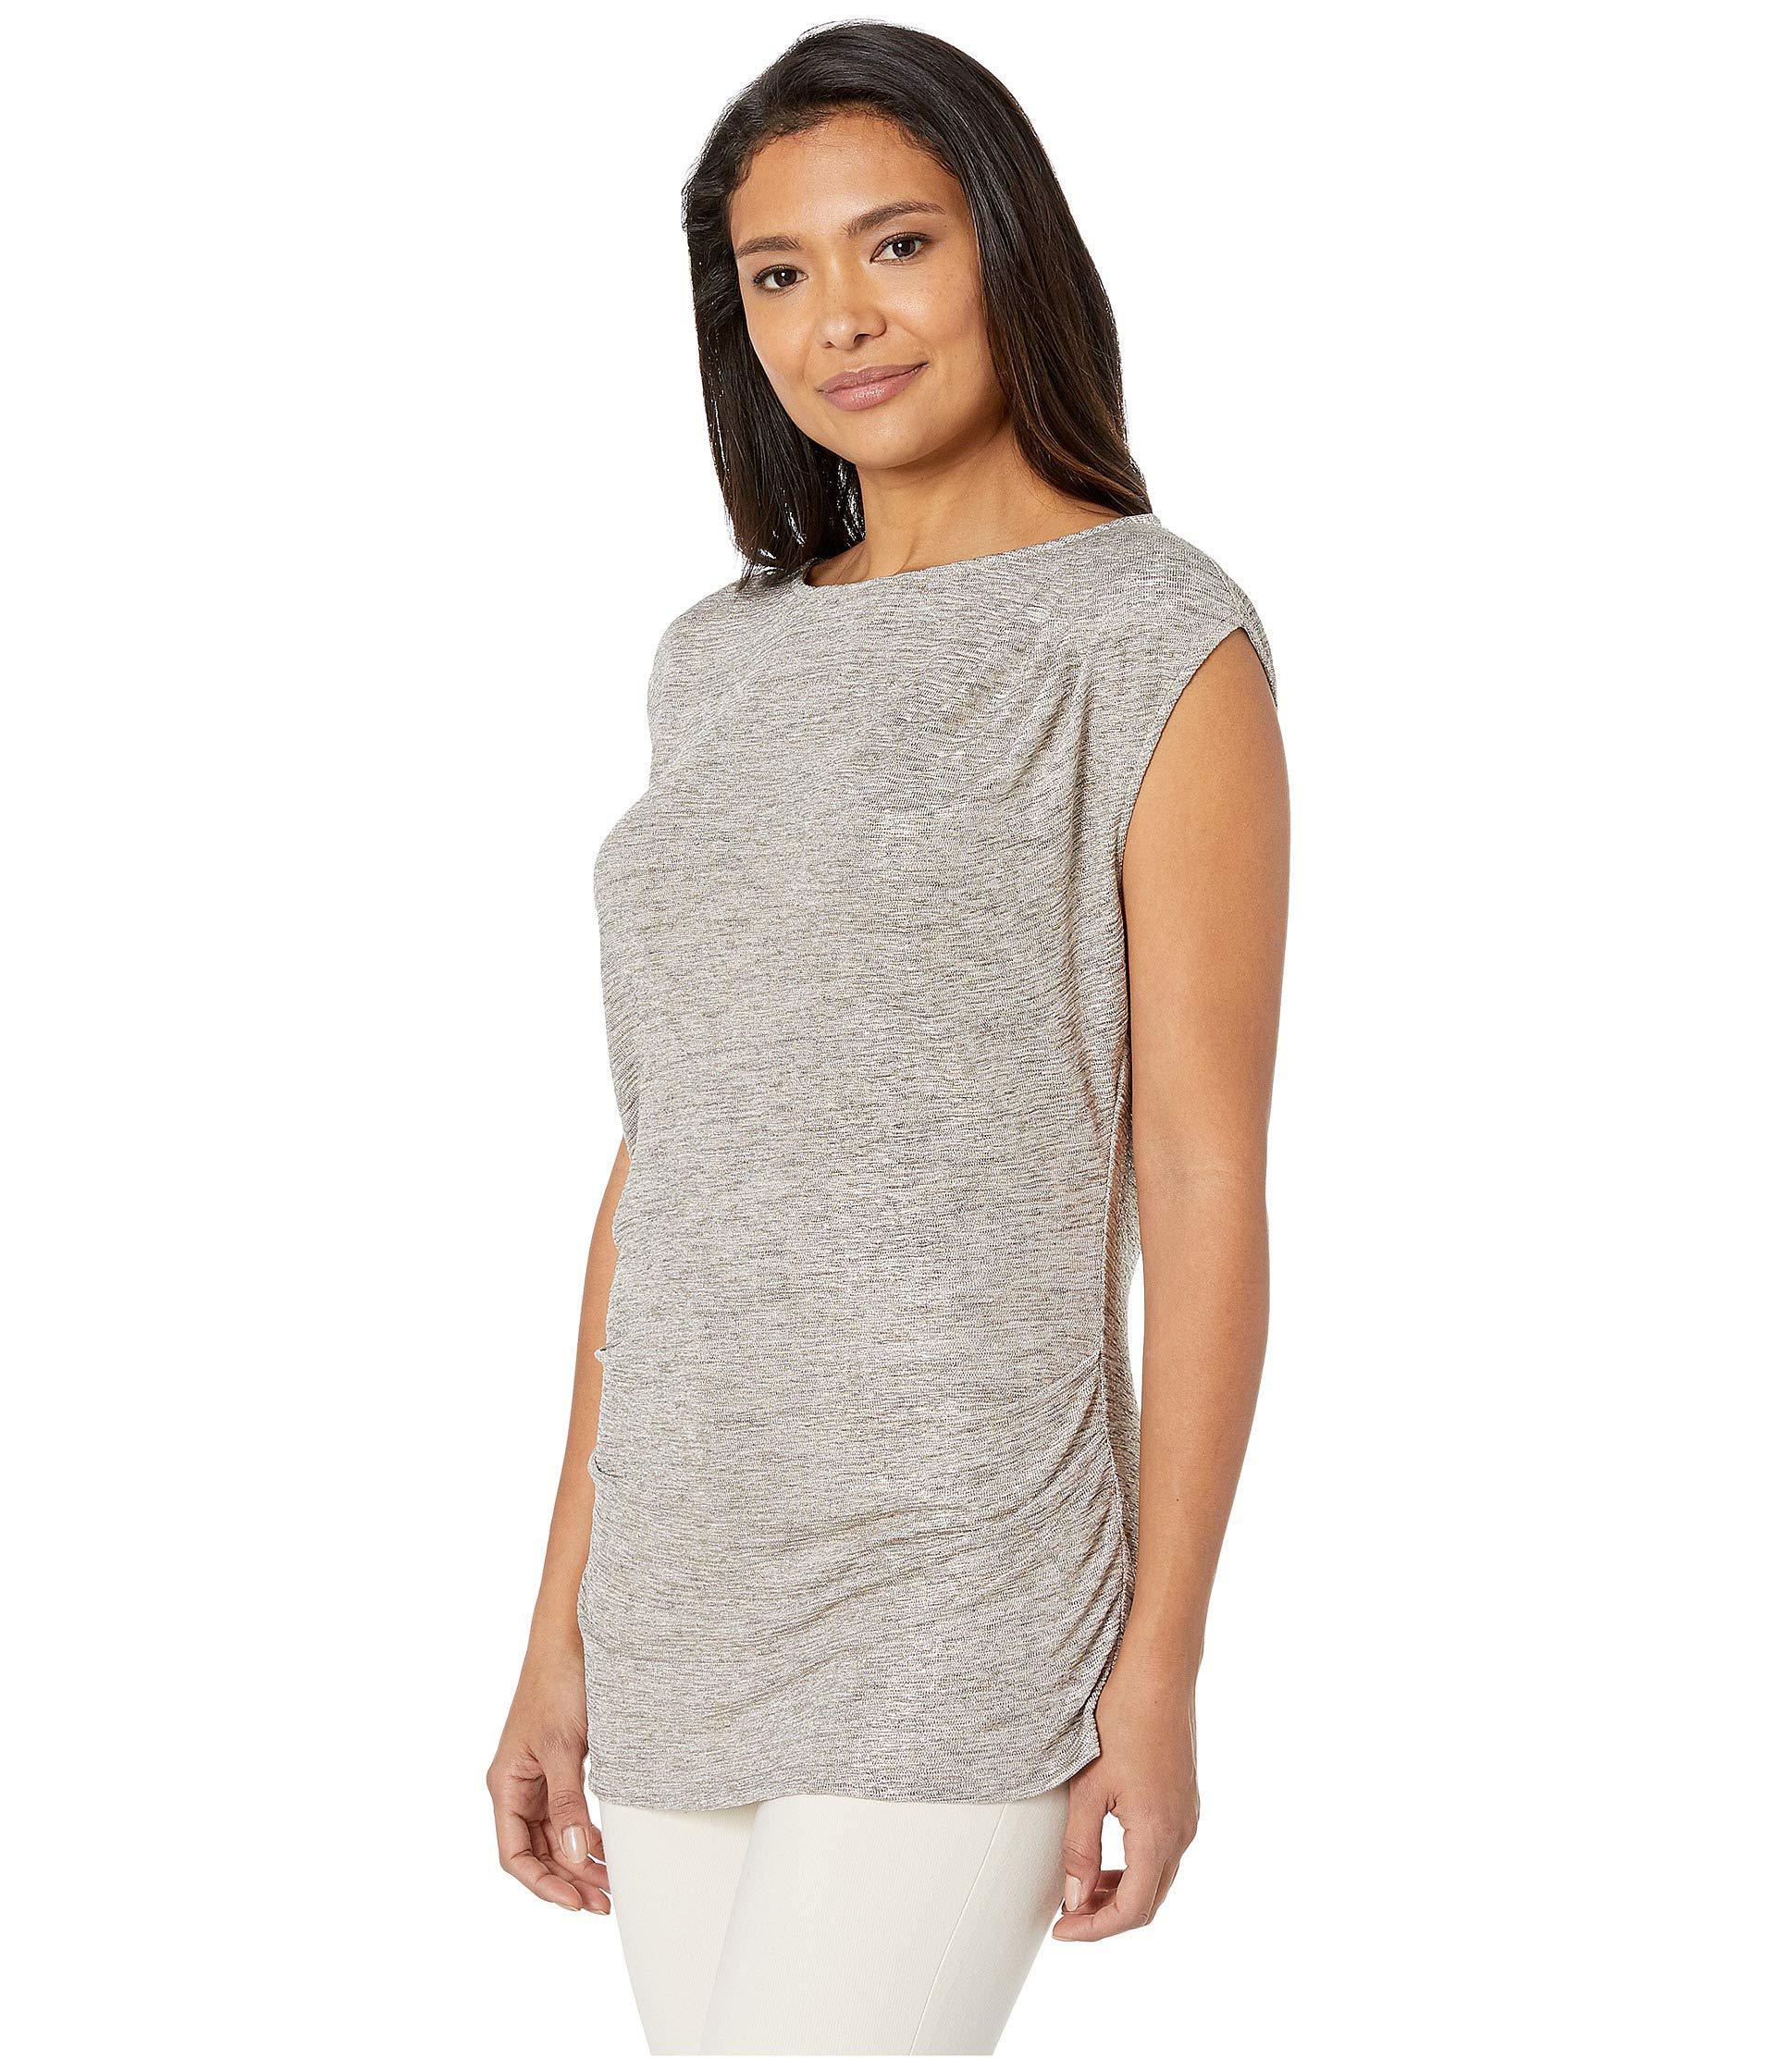 eb3e46a514971 Lyst - Calvin Klein Sleeveless Top With Ruching (gold) Women s Sleeveless  in Metallic